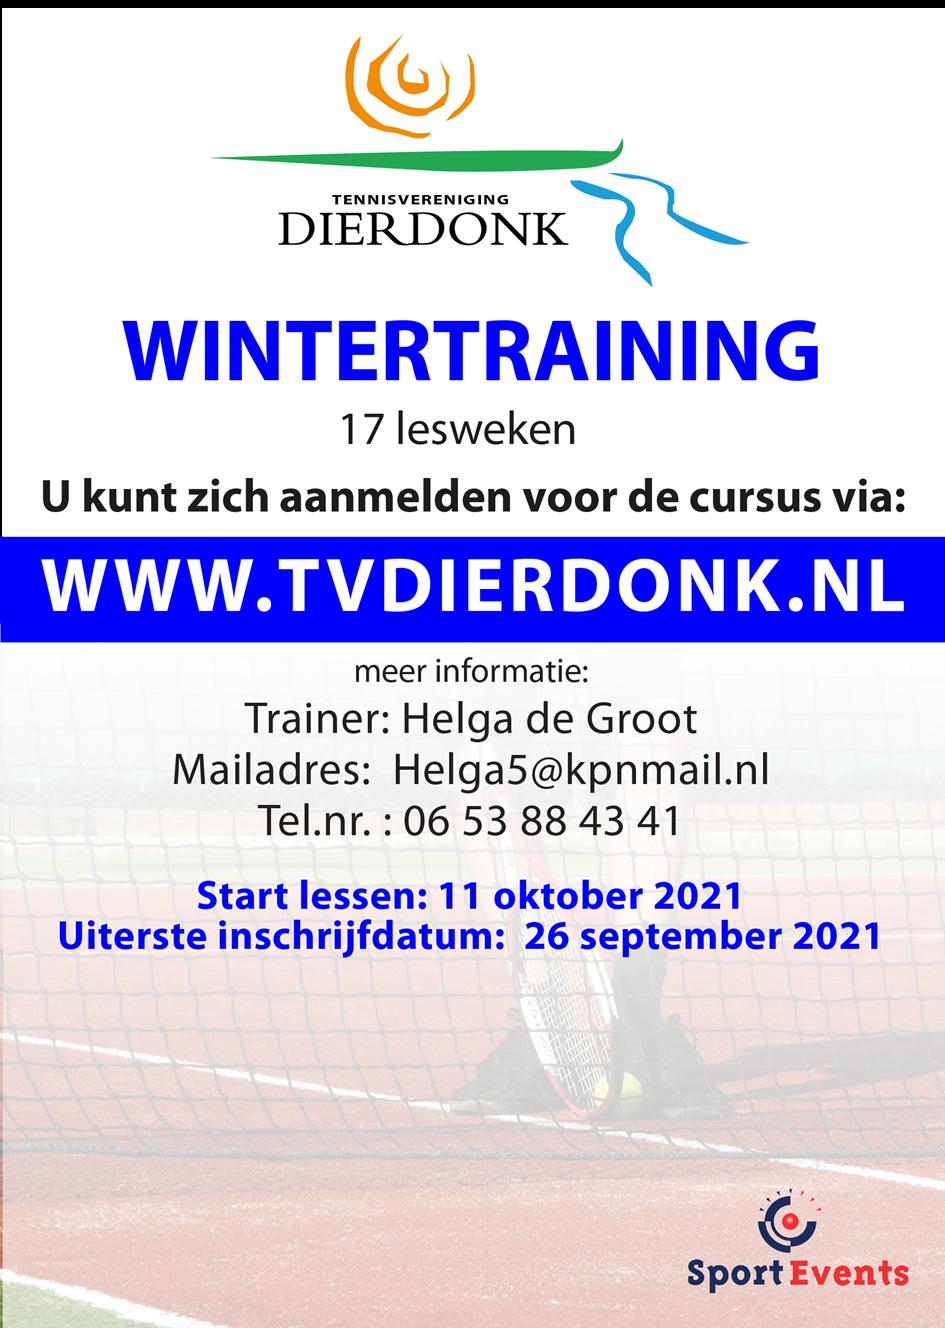 flyer winter 21-22 Dierdonk.png